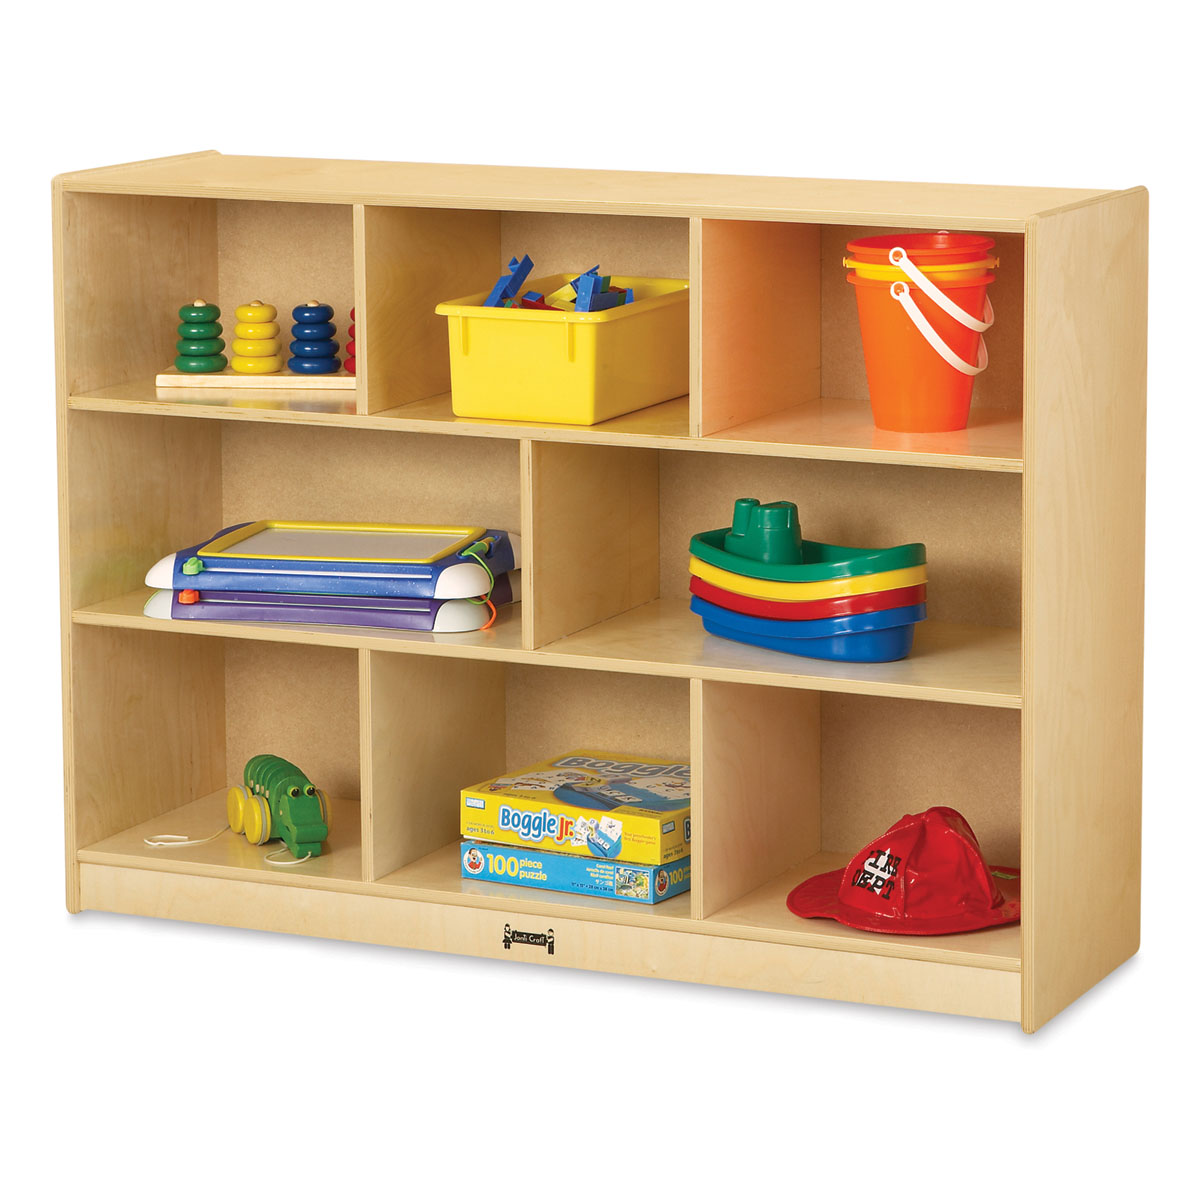 Jonti-Craft Mobile Storage Cabinet - Super-Sized